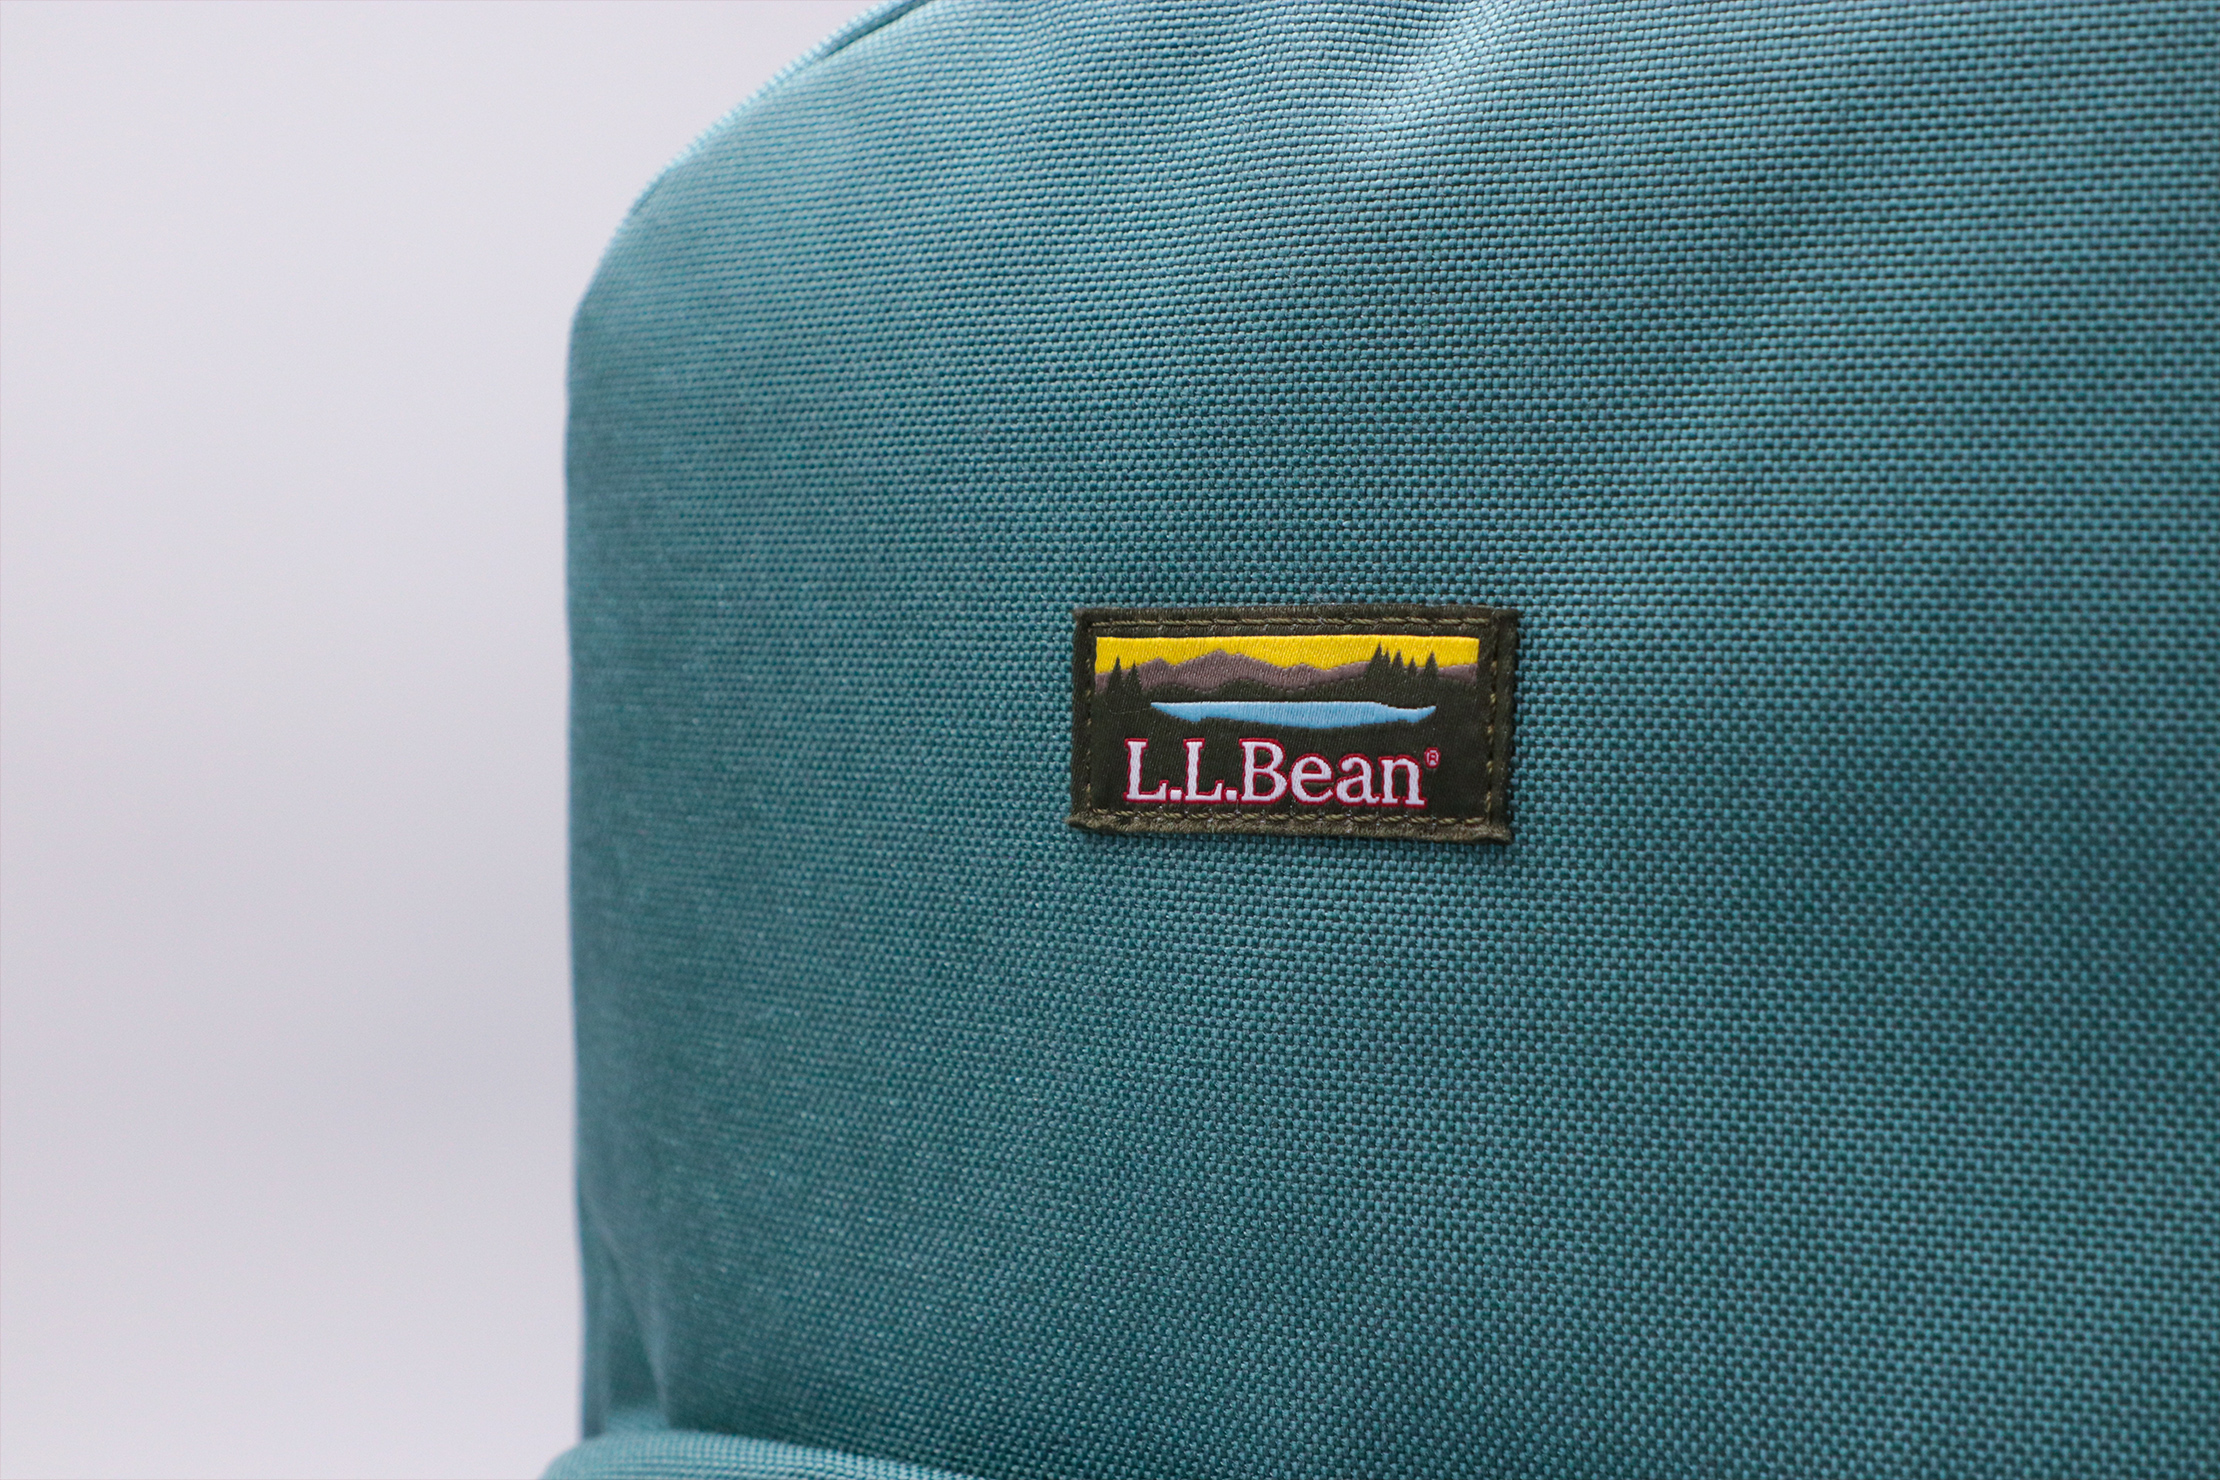 L.L.Bean Mountain Classic Cordura Pack Logo